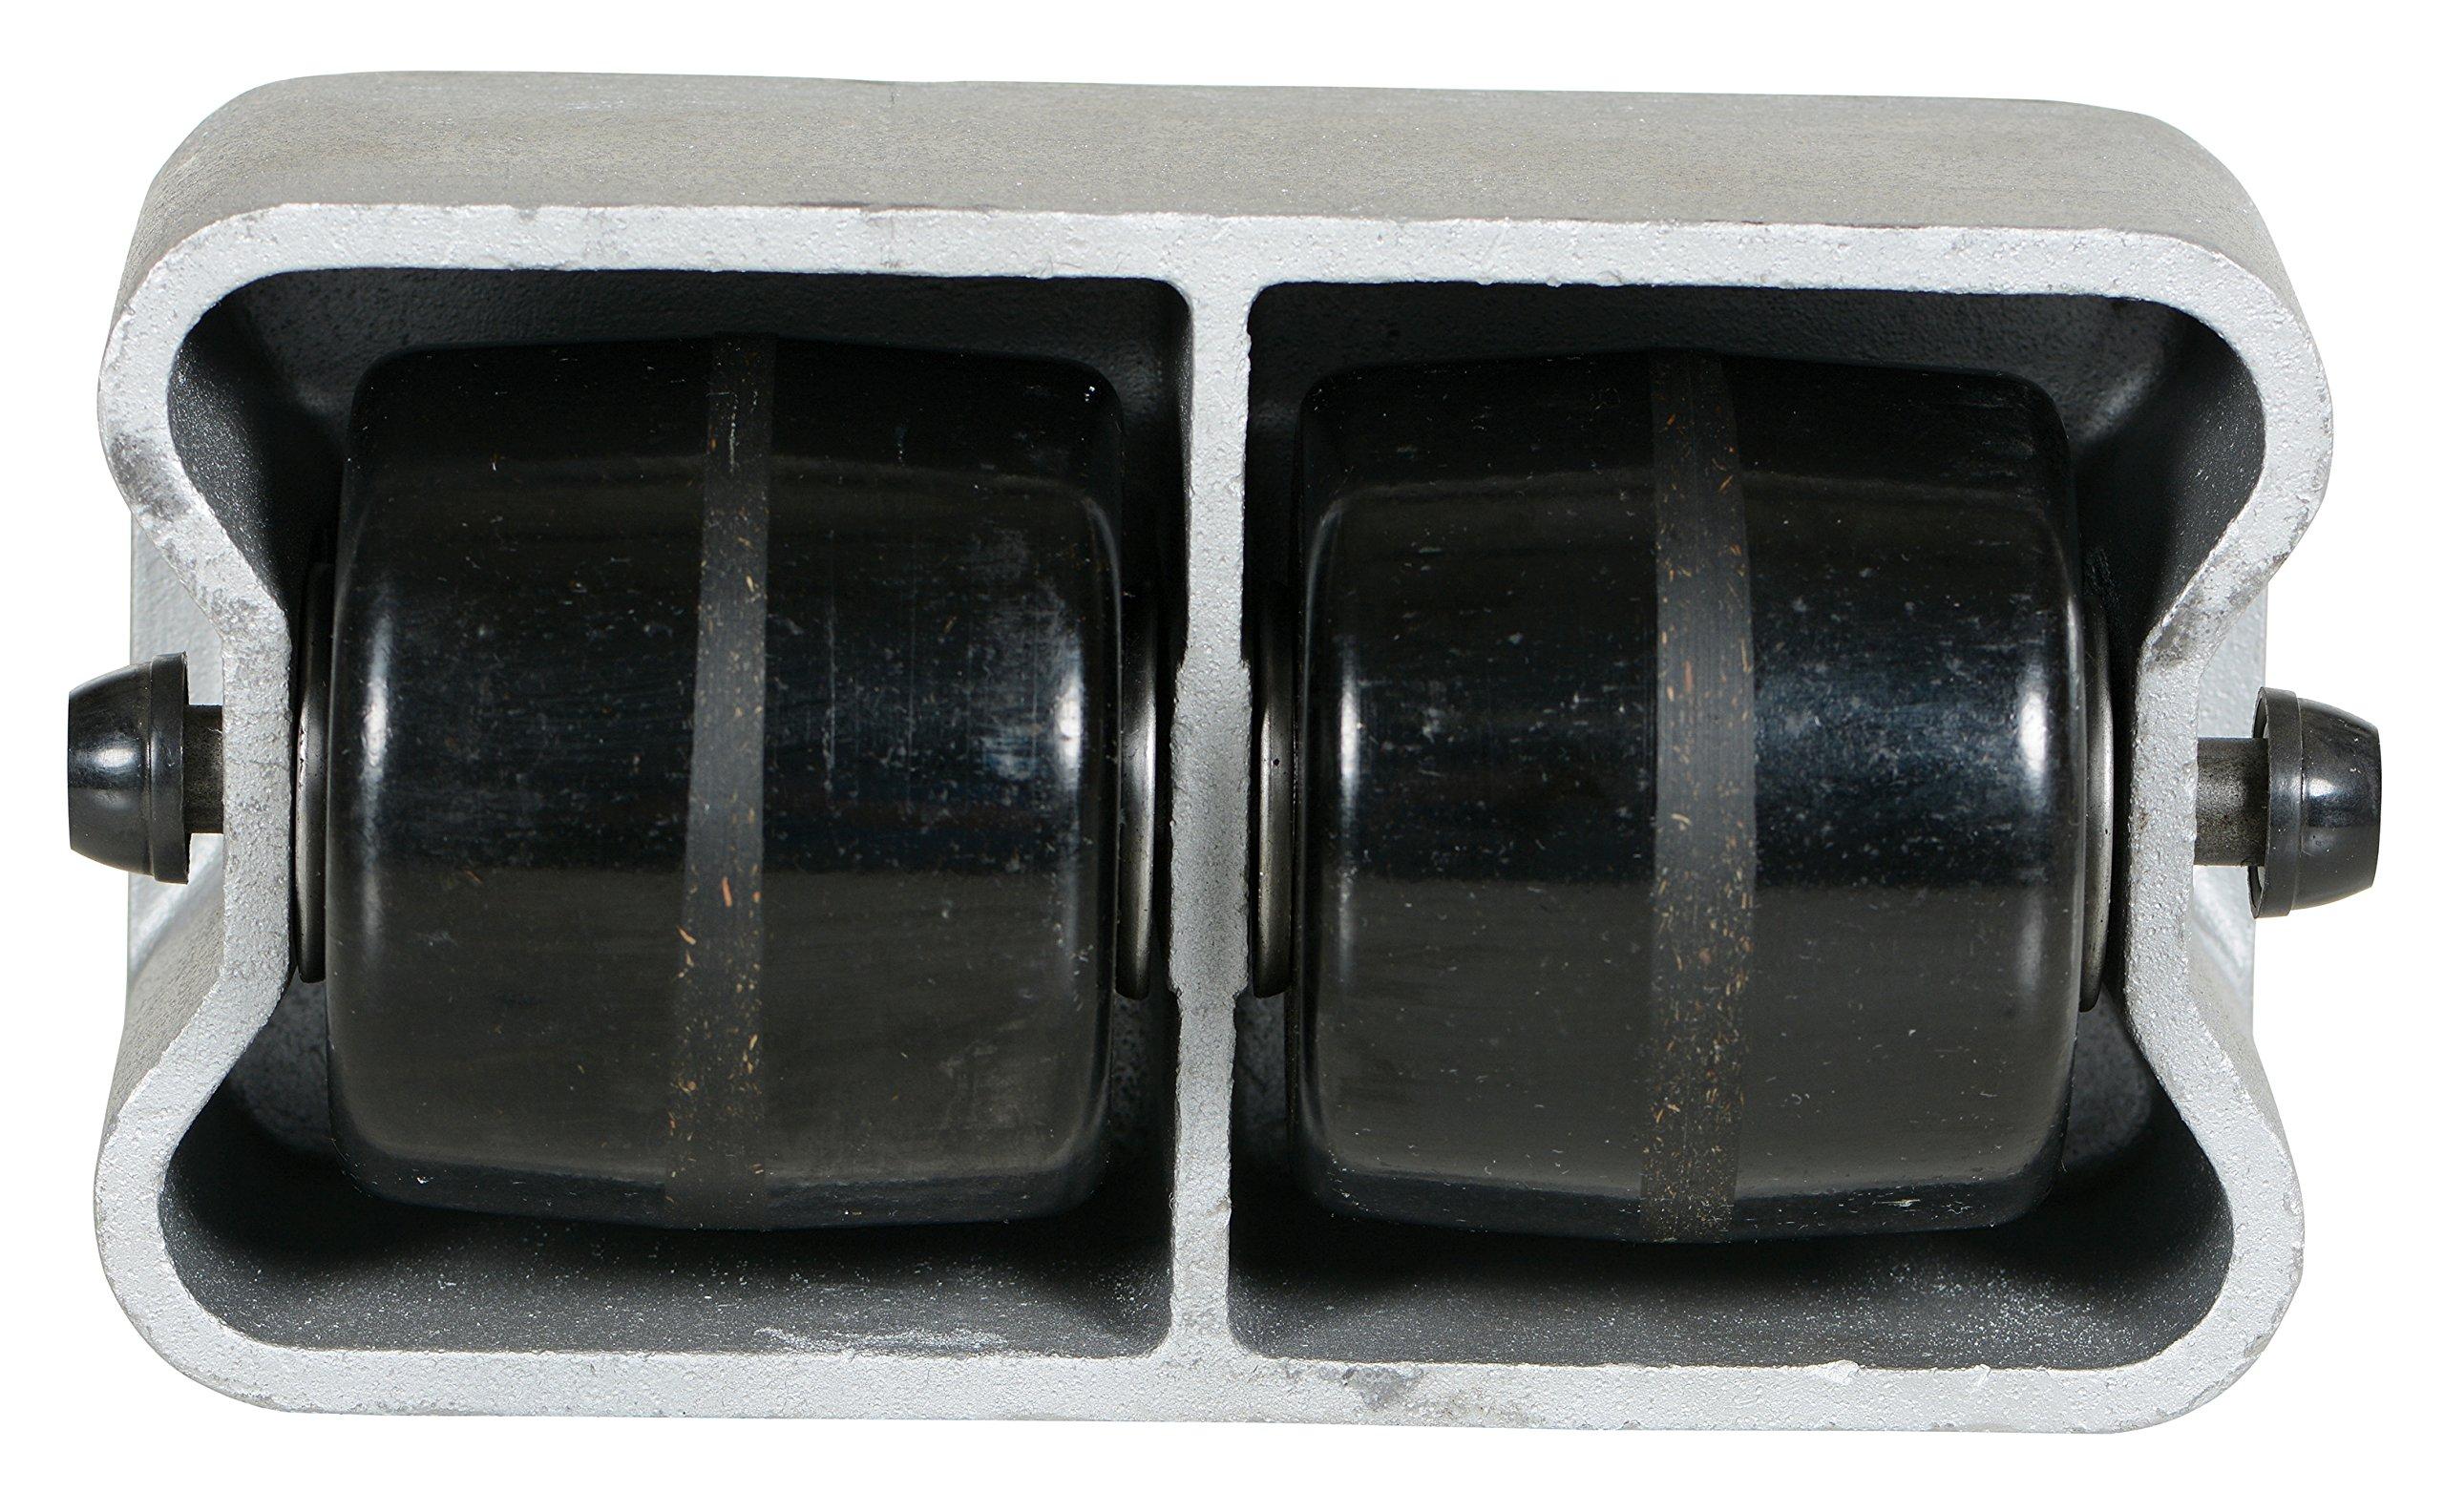 Vestil VPRDO-2 Cast Aluminum Propel Dolly, 3000 lbs Capacity, 8-1/2'' Length x 4-3/4'' Width Deck, 4-1/4'' Overall Height by Vestil (Image #3)